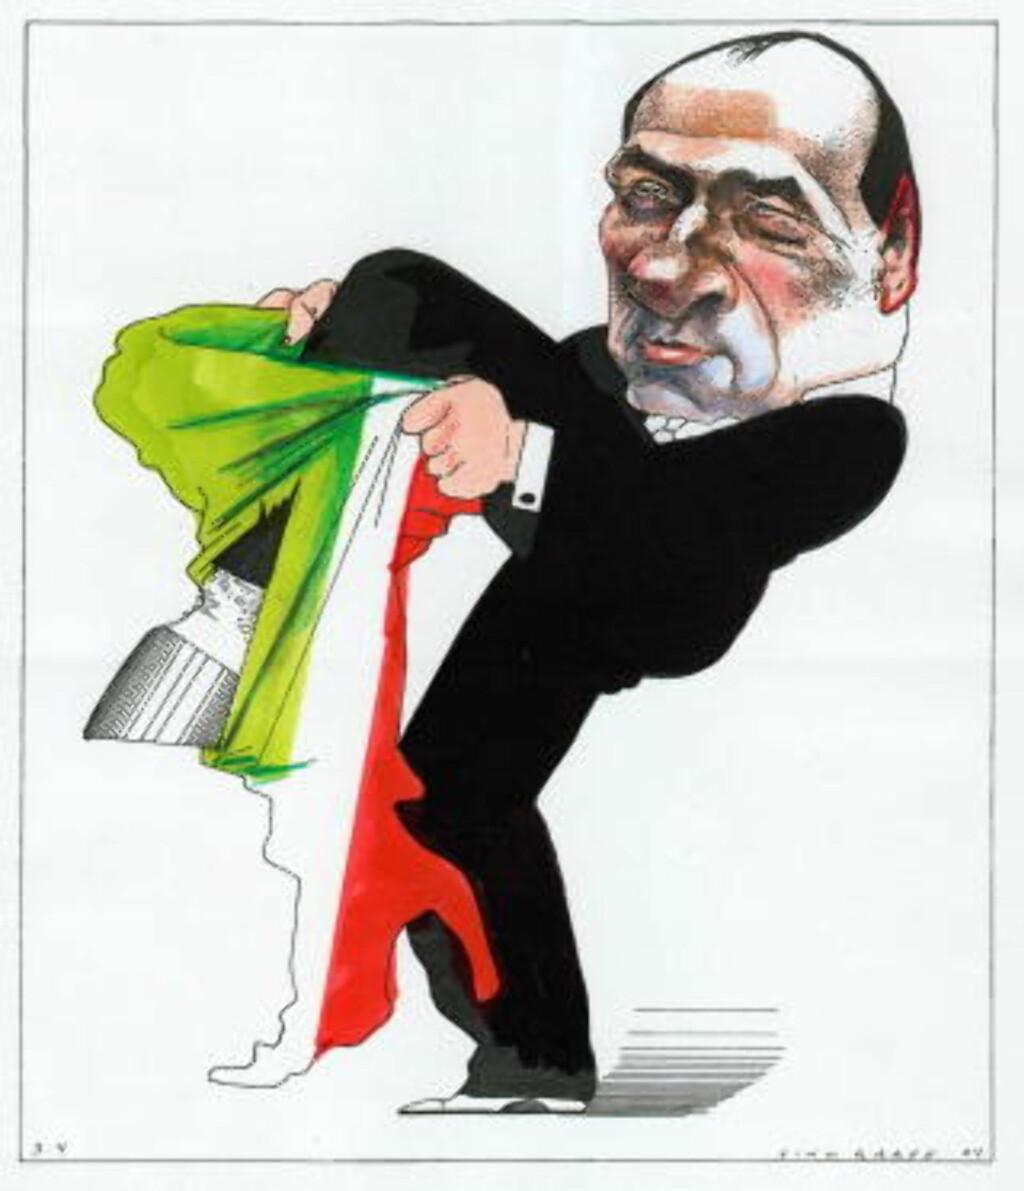 STATSMINISTER: Silvio Berlusconi. Tegning: Finn Graff